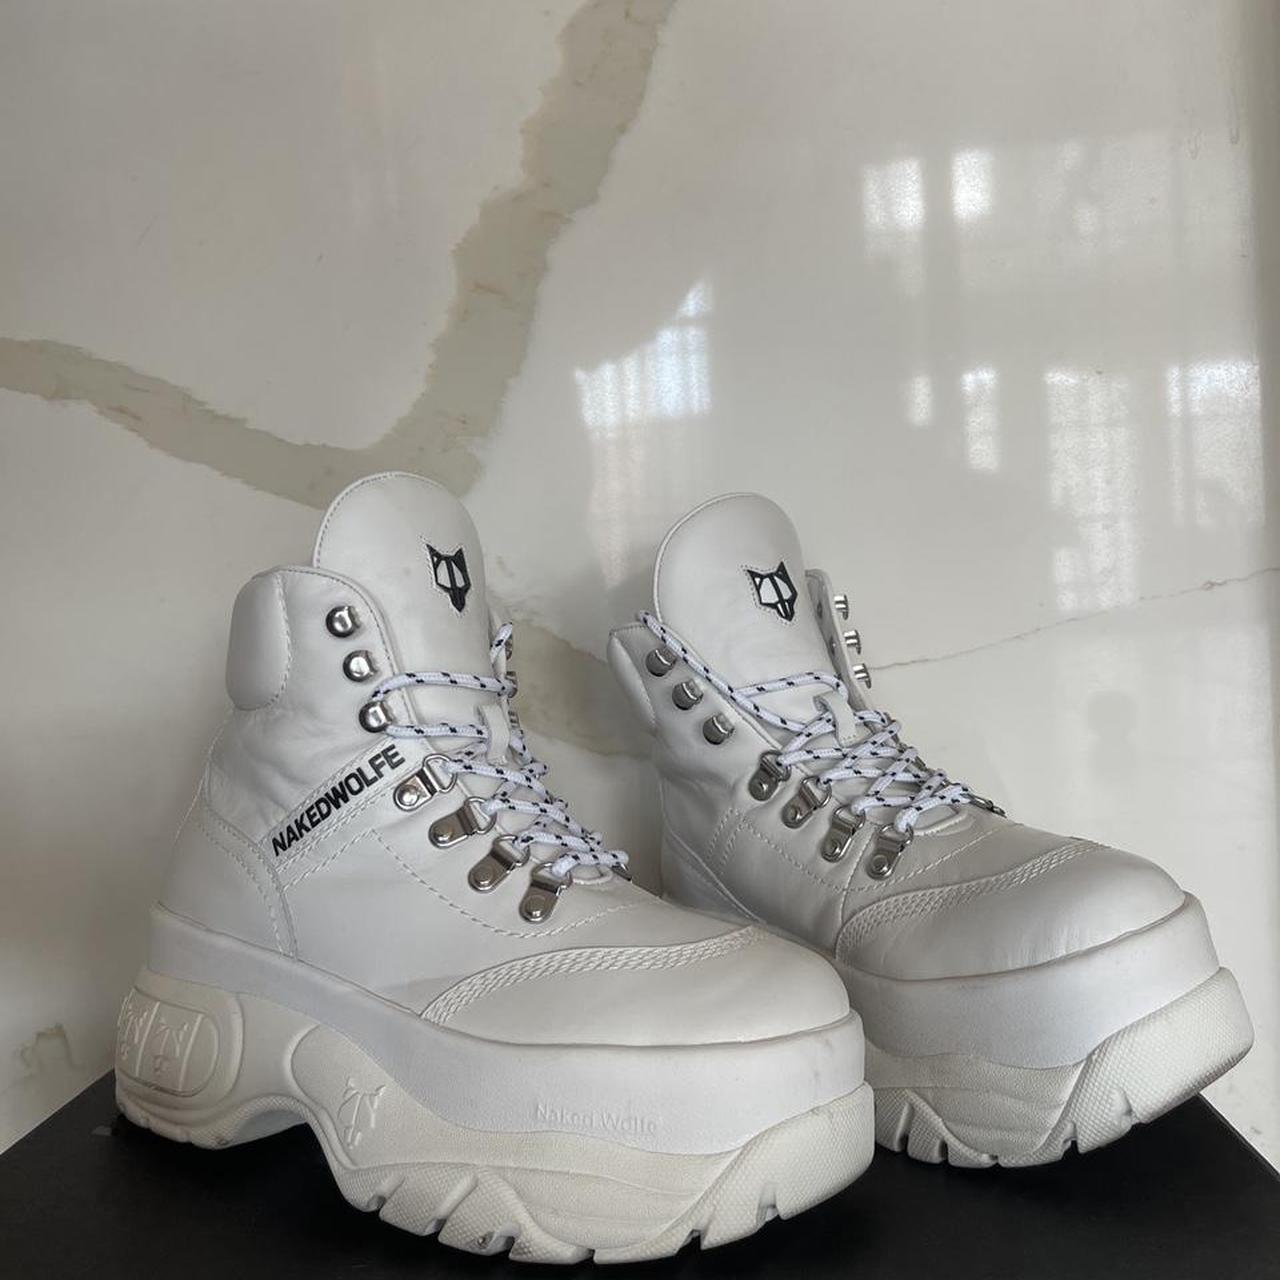 Product Image 1 - Naked Wolfe platform boots. Worn